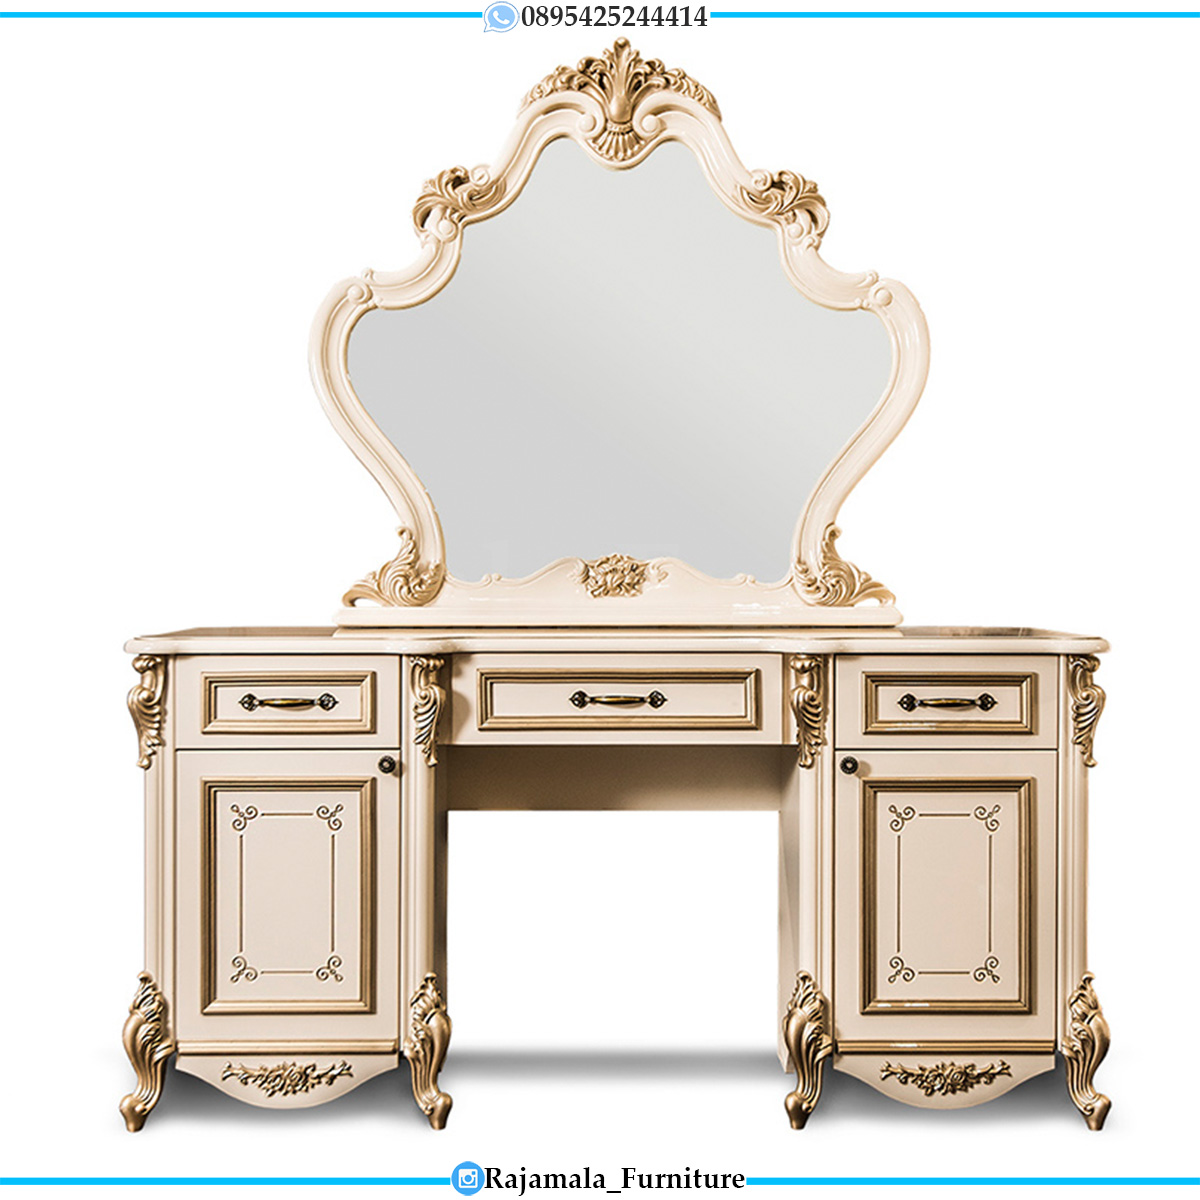 Meja Rias Mewah Luxury Carving Furniture Jepara Classic RM-0546